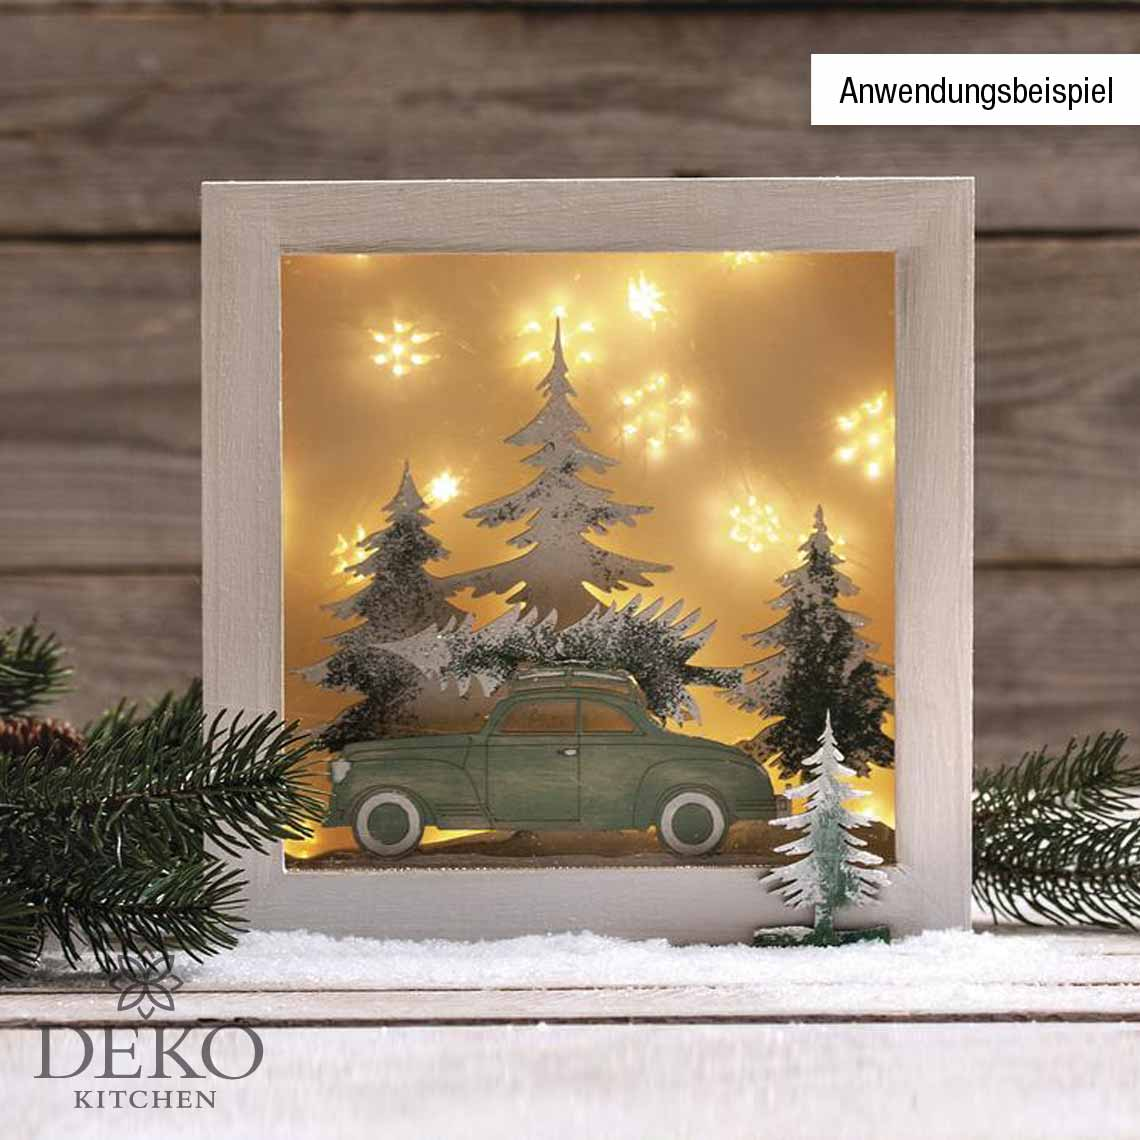 Holz Rahmen 24 X 24cm Mit Acrylglas Deko Kitchen Shop